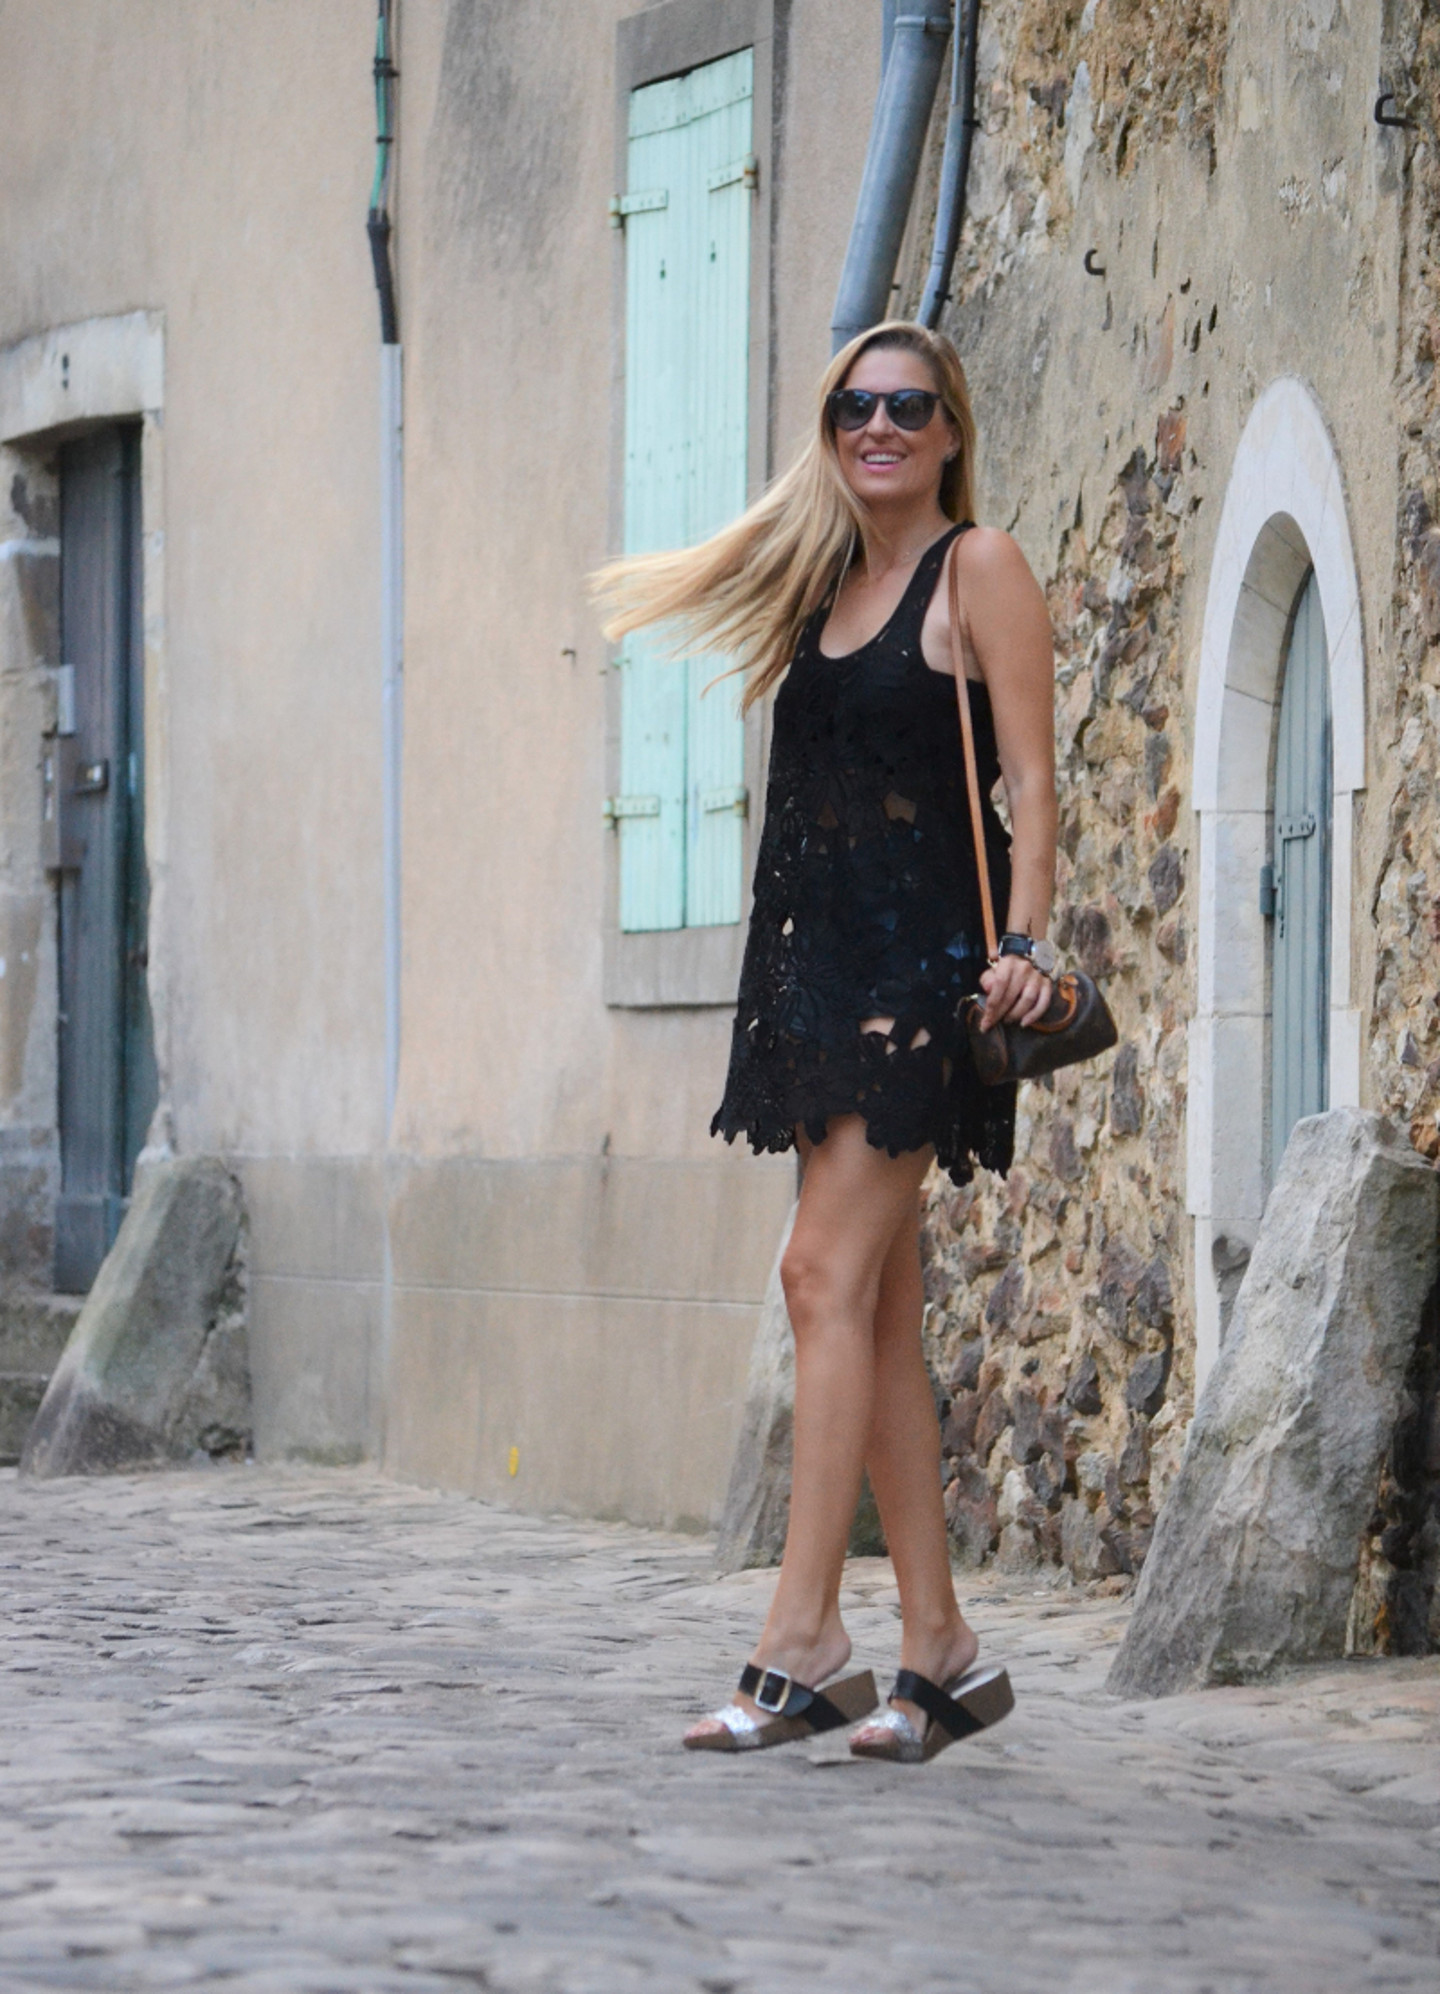 Le_Mans_Black_Dress_Sandals_Louis_Vuitton_Mini_Speedy_Lara_Martin_Gilarranz_Bymyheels (12)